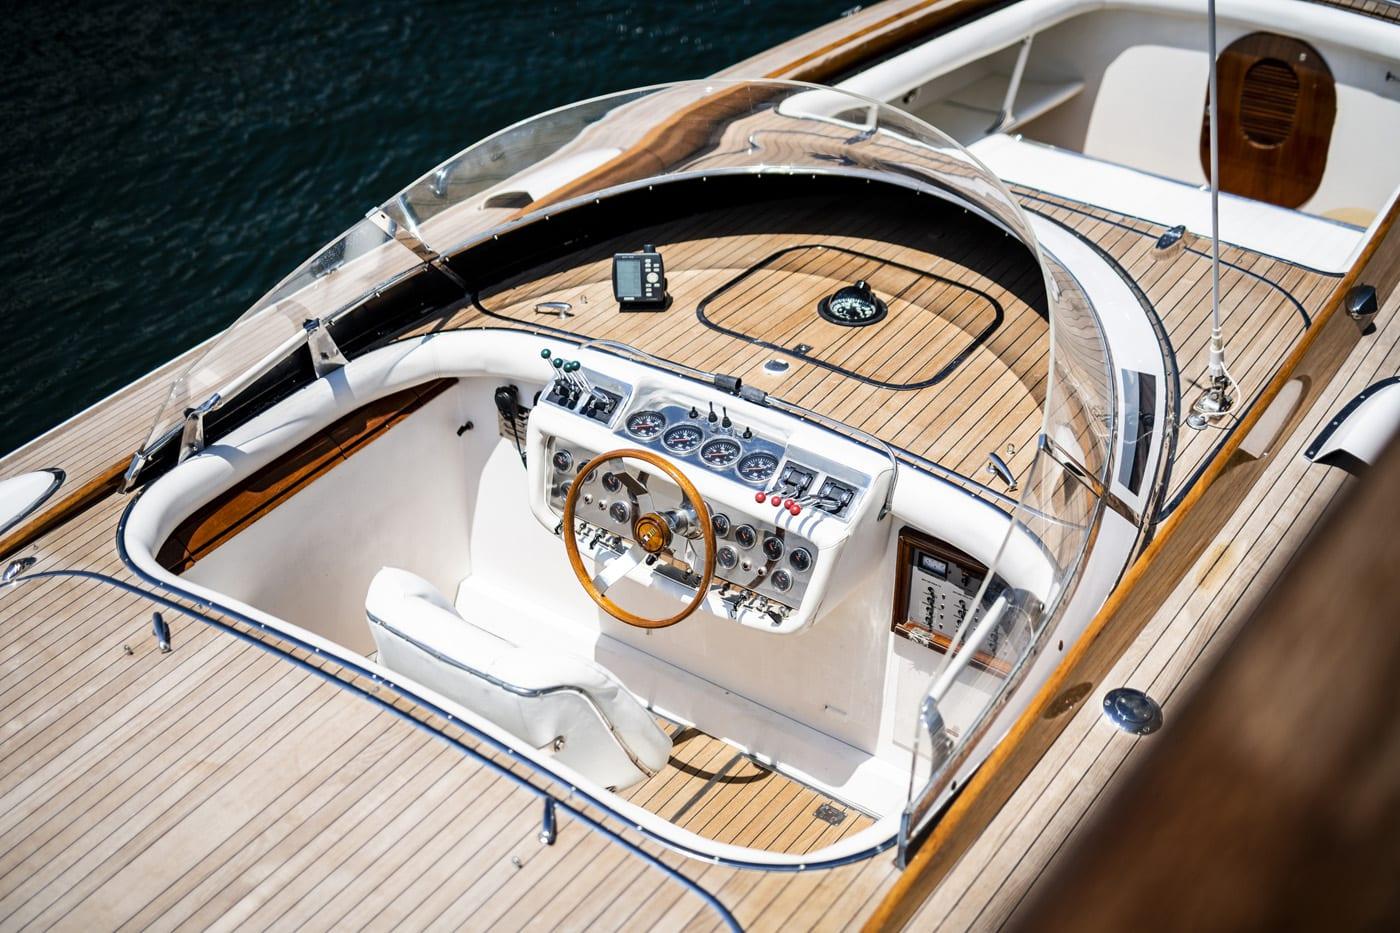 Gianni Agnelli's Boat